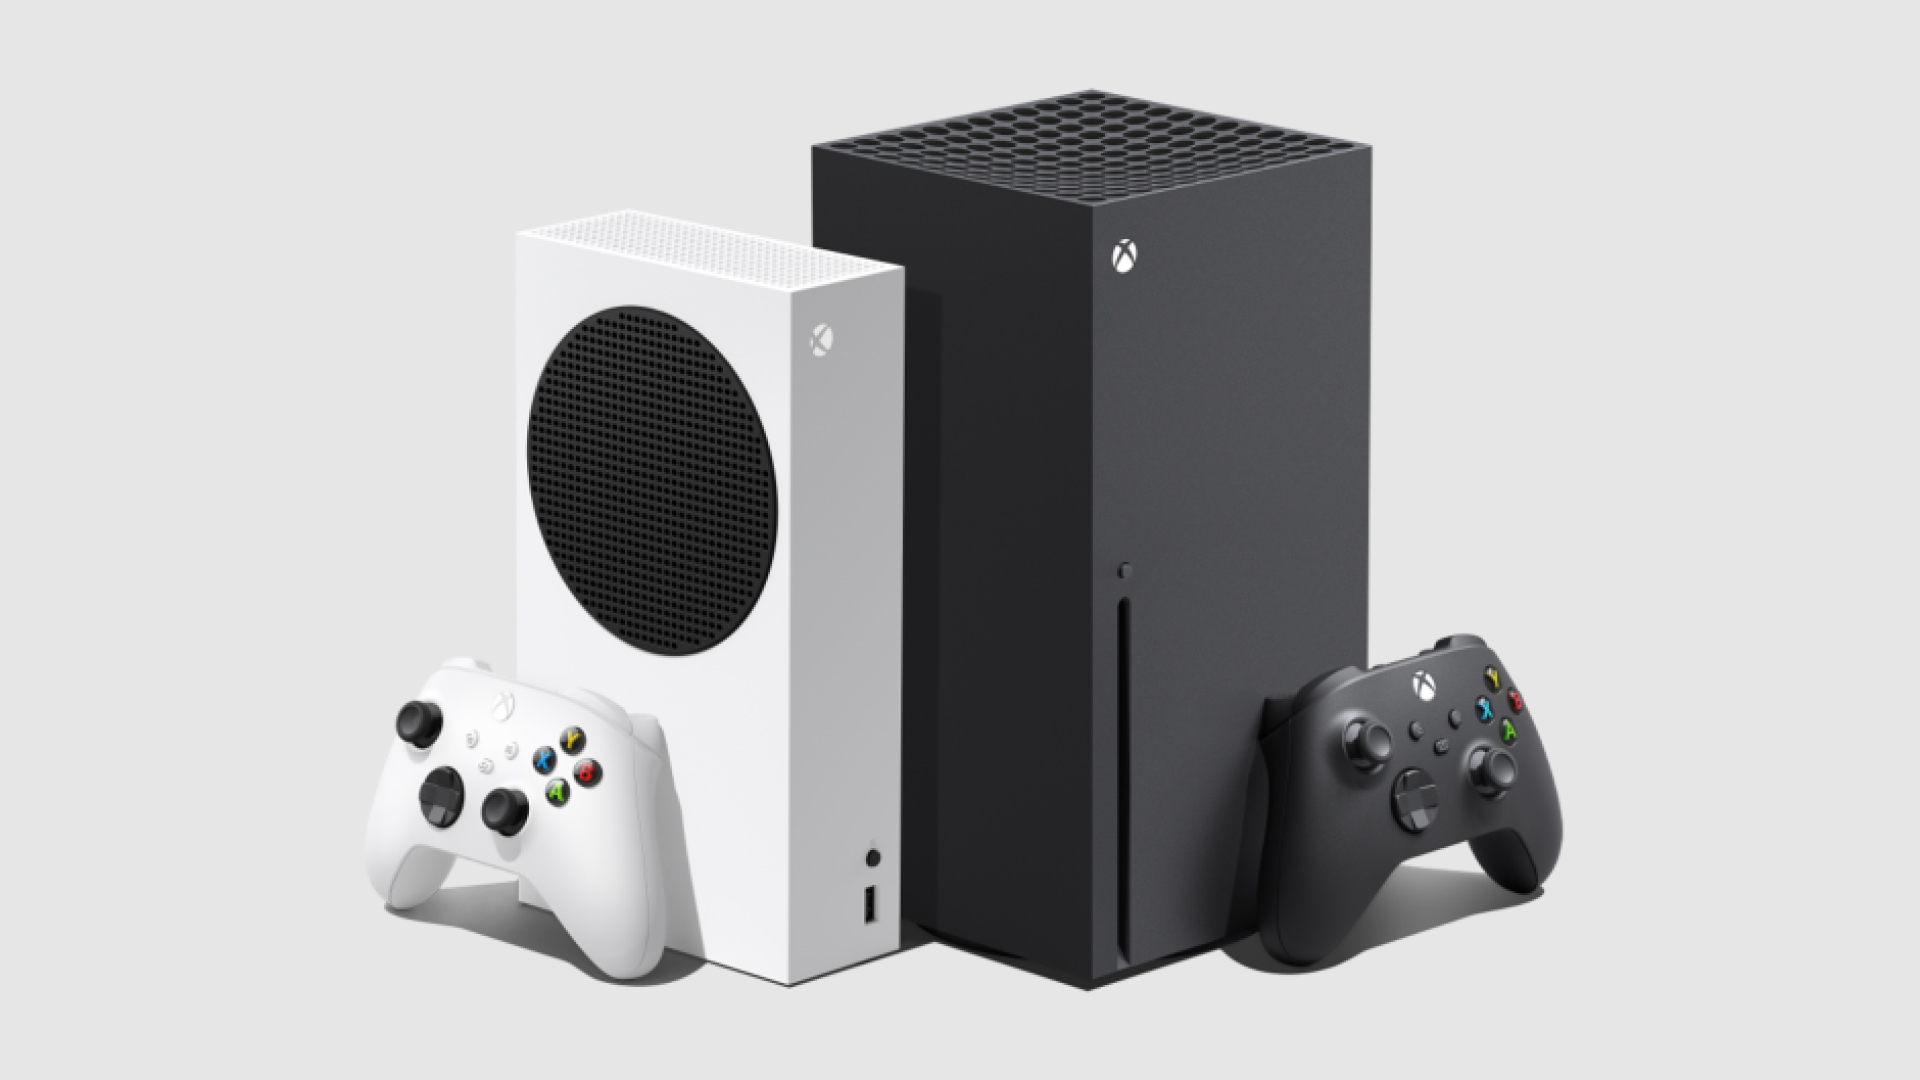 Xbox Series X and Xbox Series S Now Available Worldwide XSX_XSS_Design_HERO-1.jpg